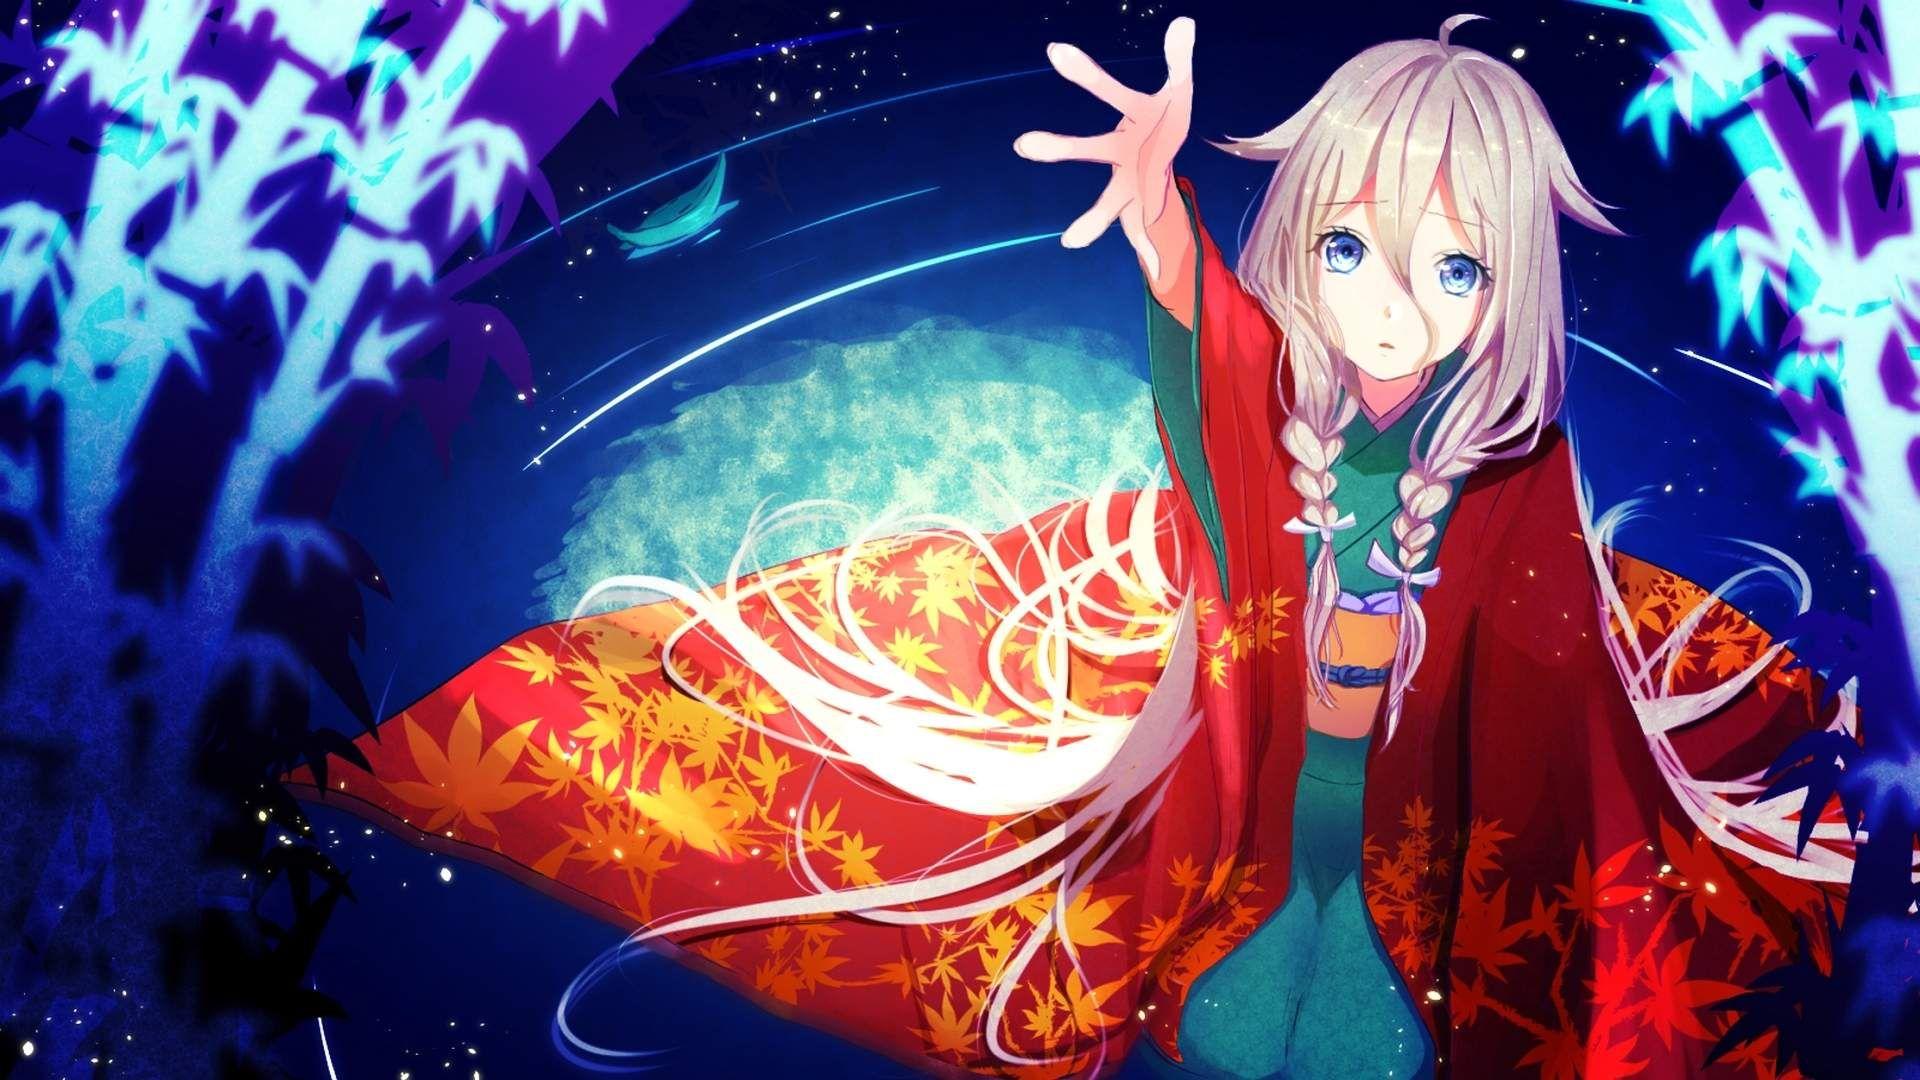 Cool Anime Wallpapers HD 1920x1080 3 Cool Anime